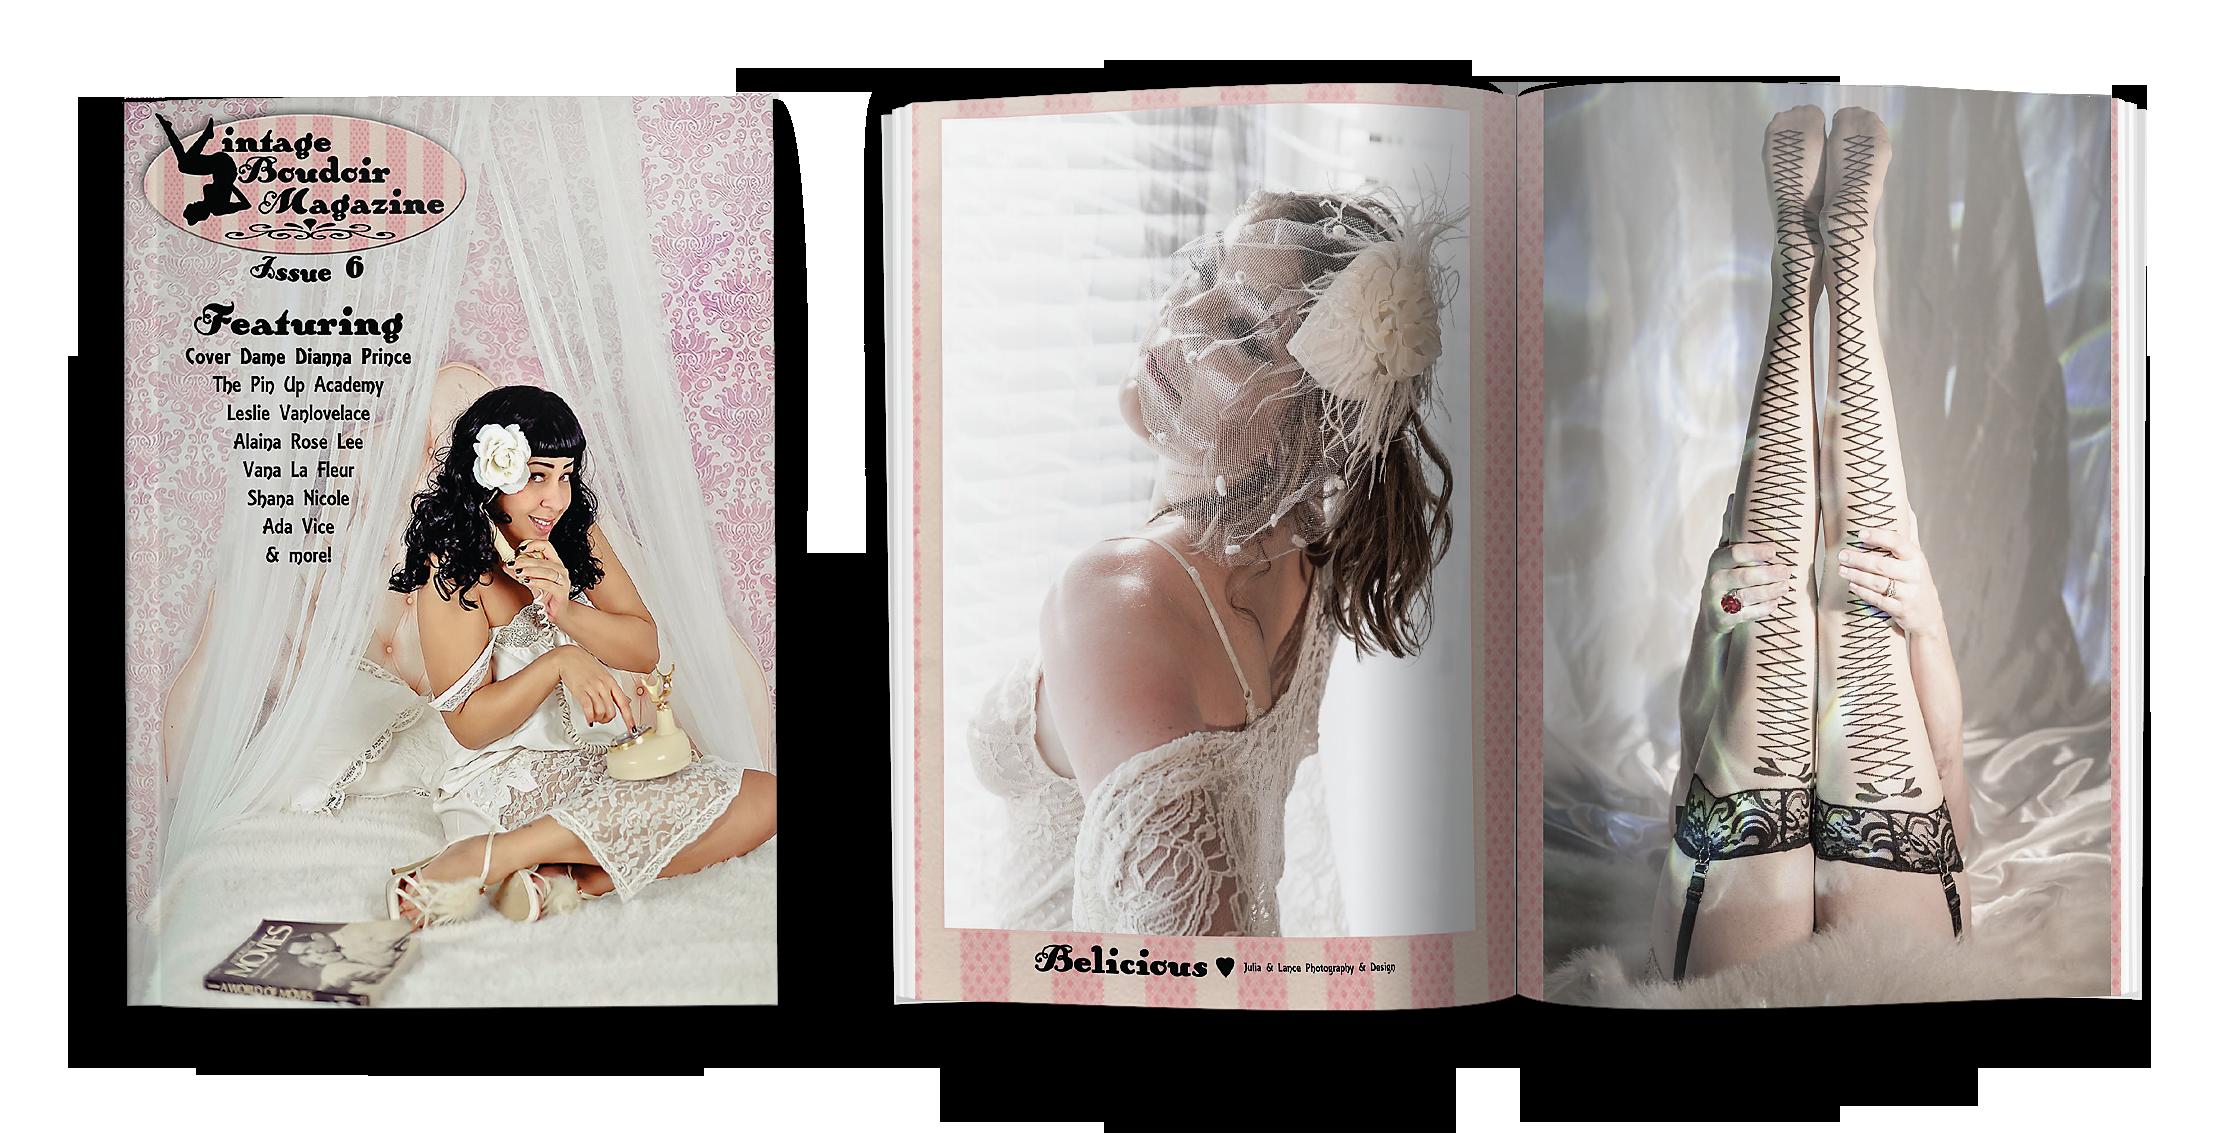 vintage_boudoir_magazine_issue_6_render1.png